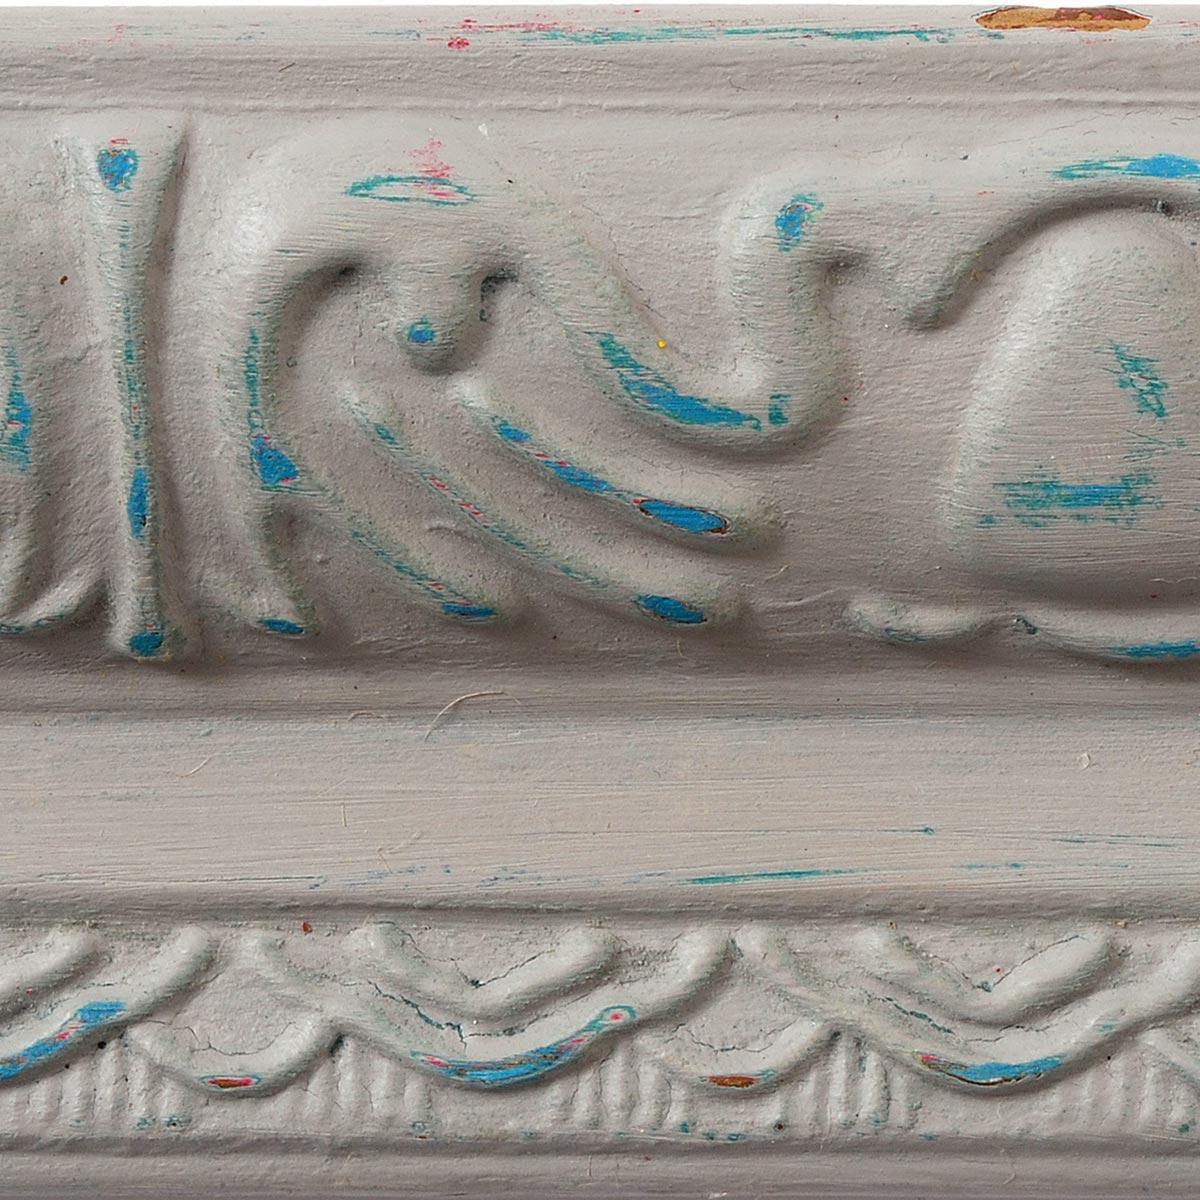 FolkArt ® Home Decor™ Chalk - Parisian Grey, 8 oz.